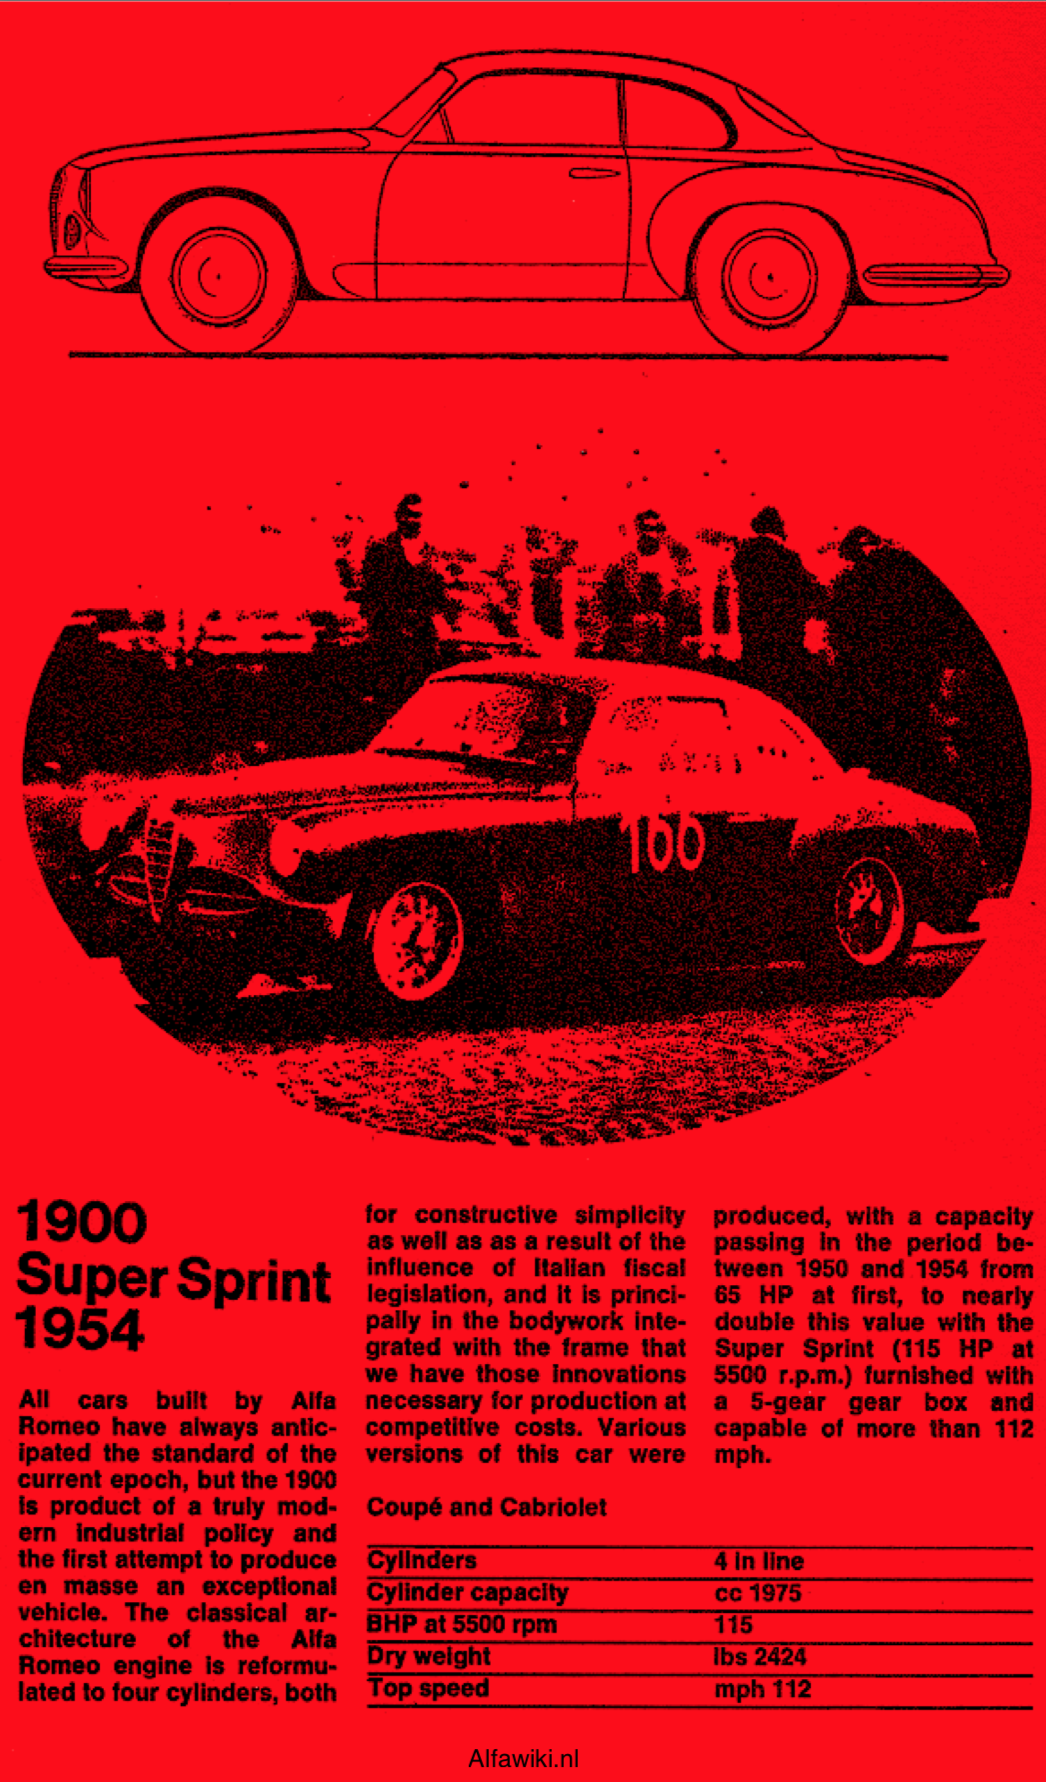 Alfa Romeo 1900 Super Sprint flyer